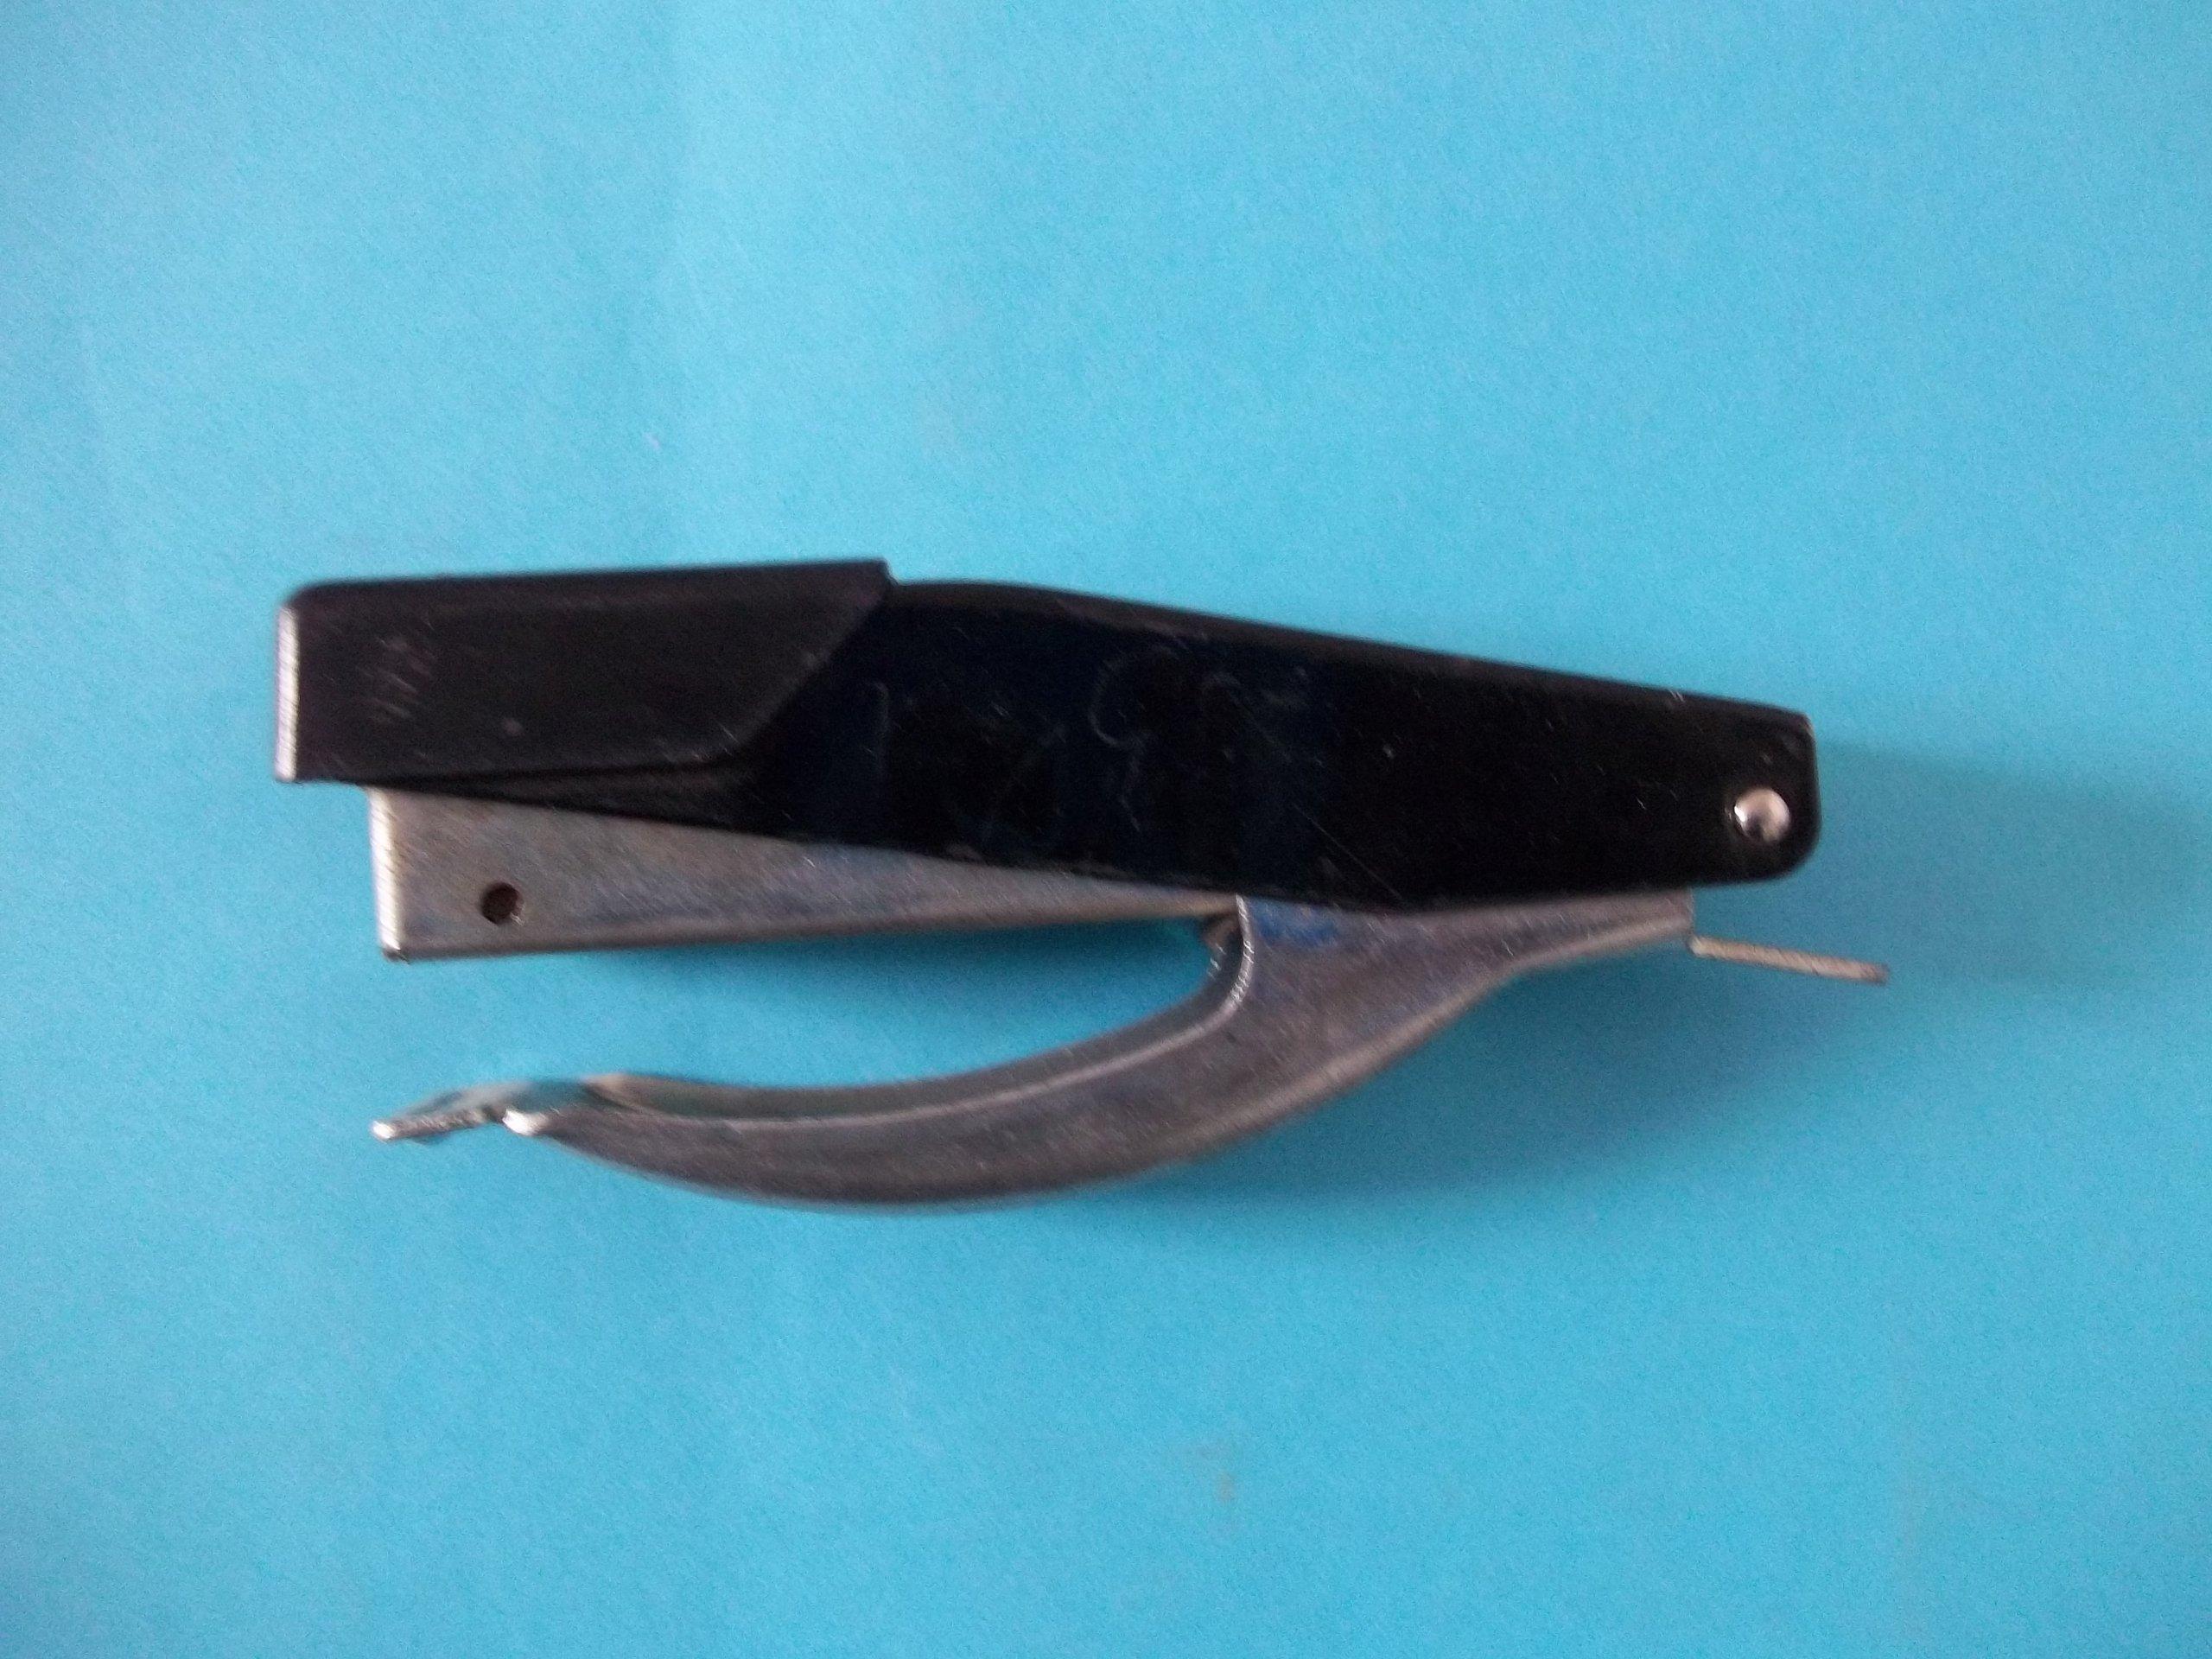 Bostitch(R) Compact Stapling Plier Black B9P